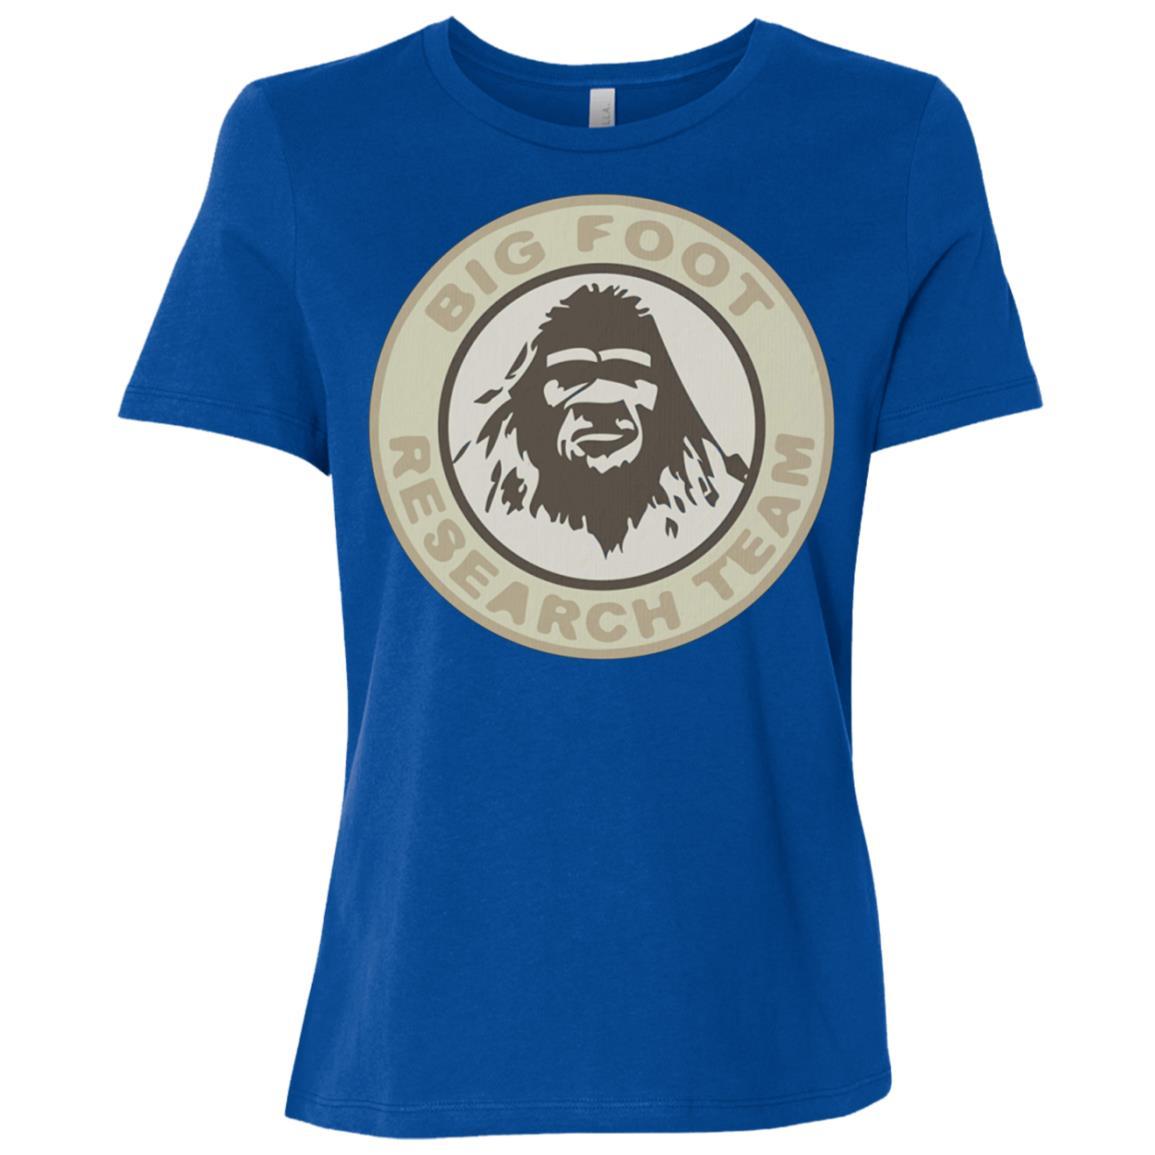 Bigfoot Yeti Research Team Sasquatch Vintage Women Short Sleeve T-Shirt